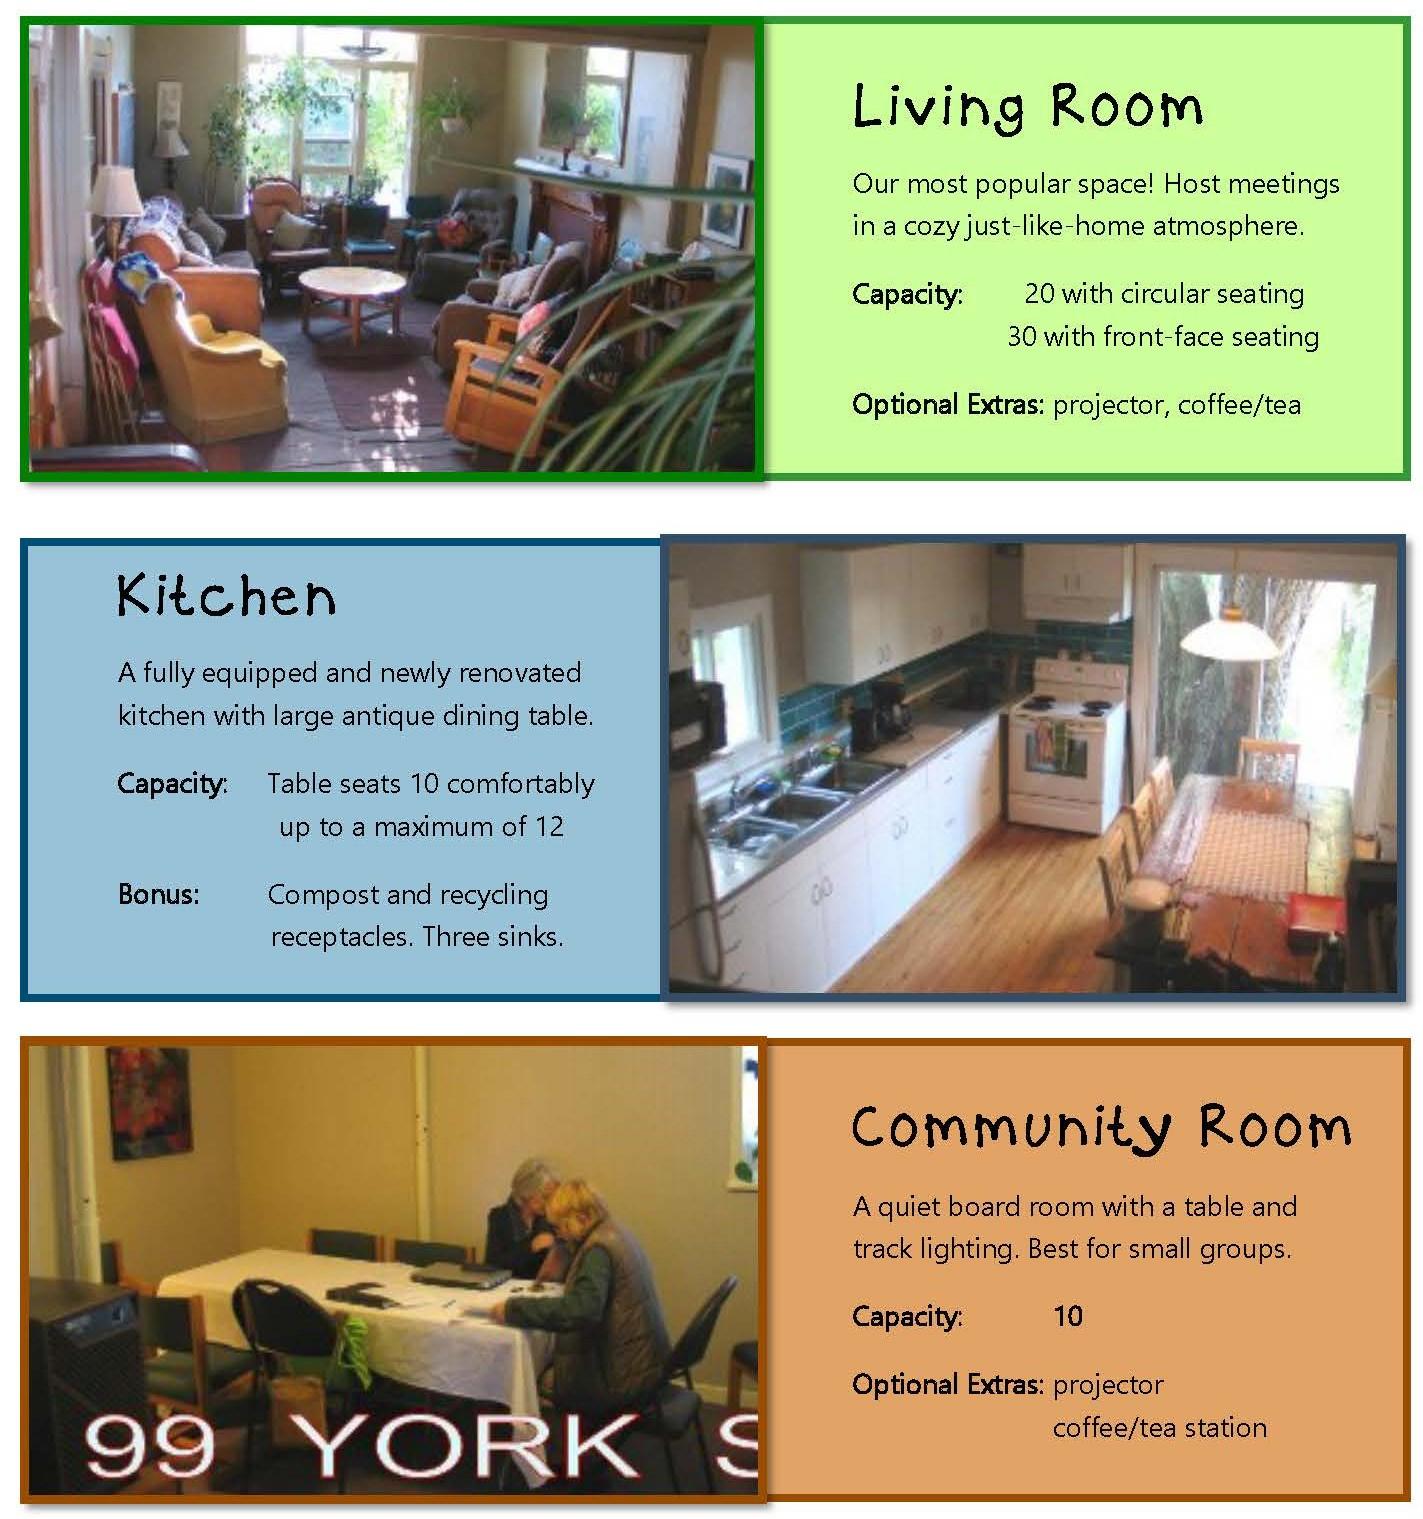 Kingston Community House At 99 York